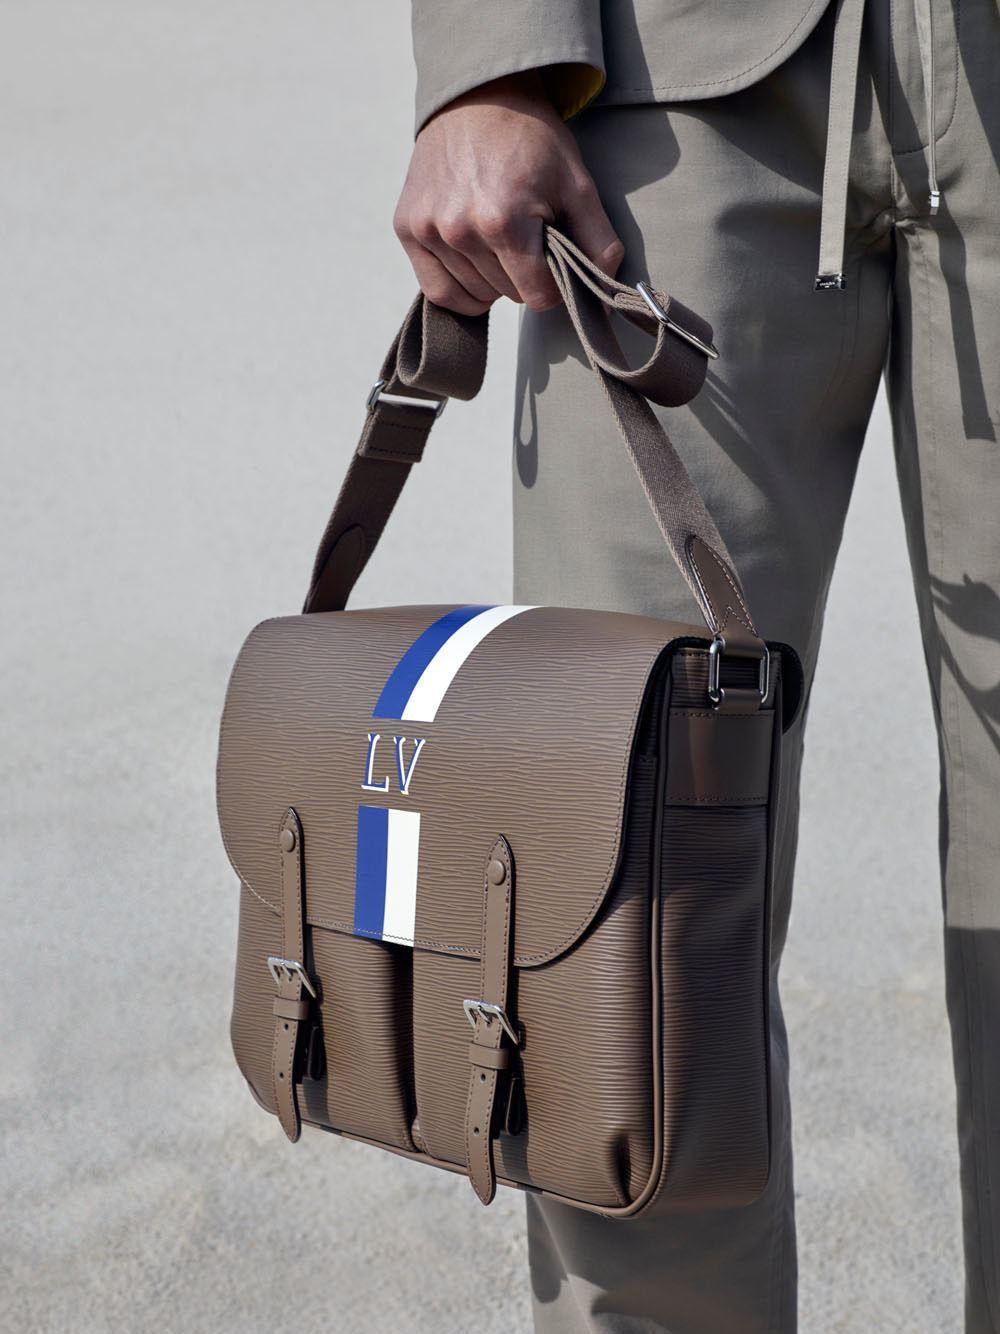 c9393d727 Male Fashion Trends: Louis Vuitton Resort 2016 Collection Acessórios  Masculinos, Bolsas Masculinas, Sapatos